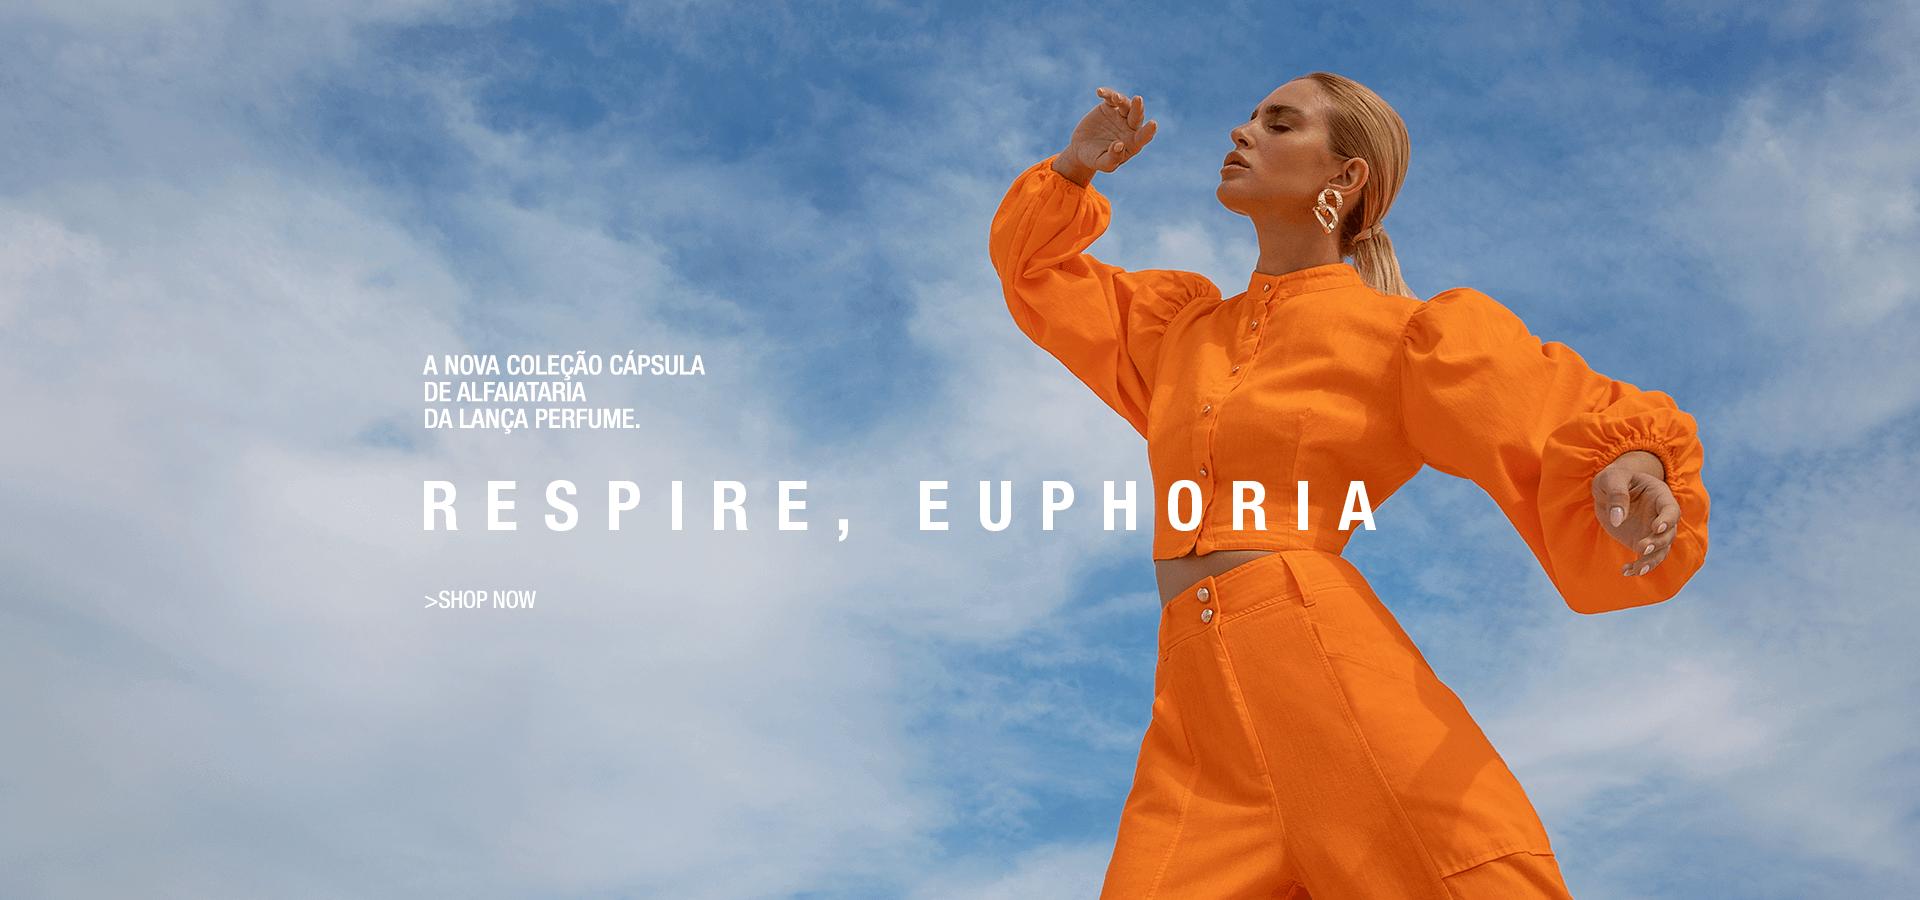 banner-euphoria